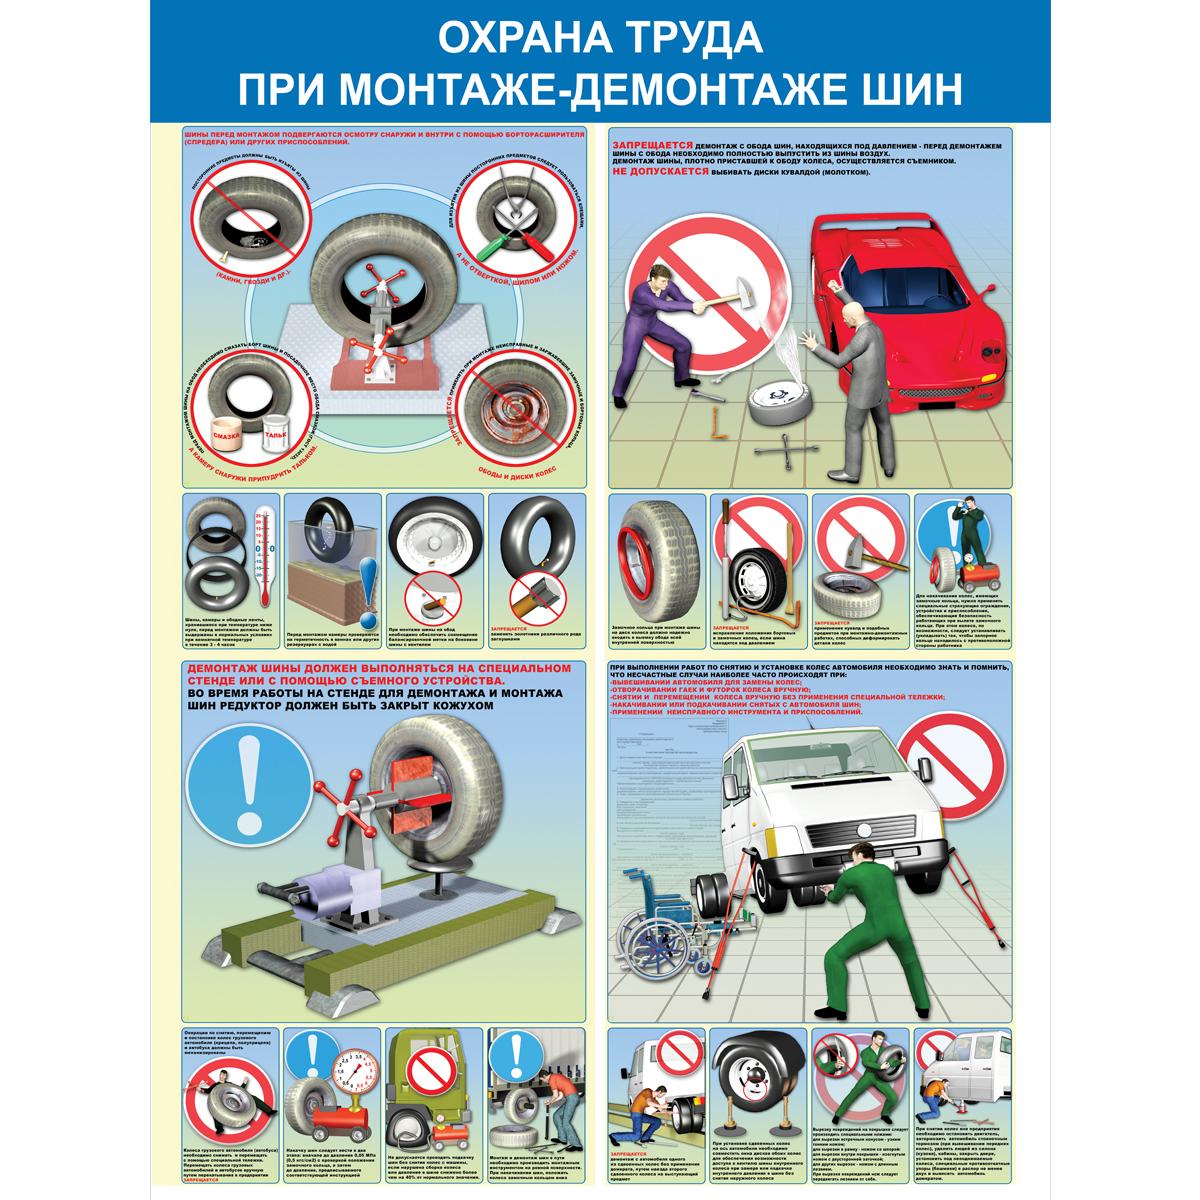 Охрана труда при монтаже (демонтаже) шин  1000х750 мм